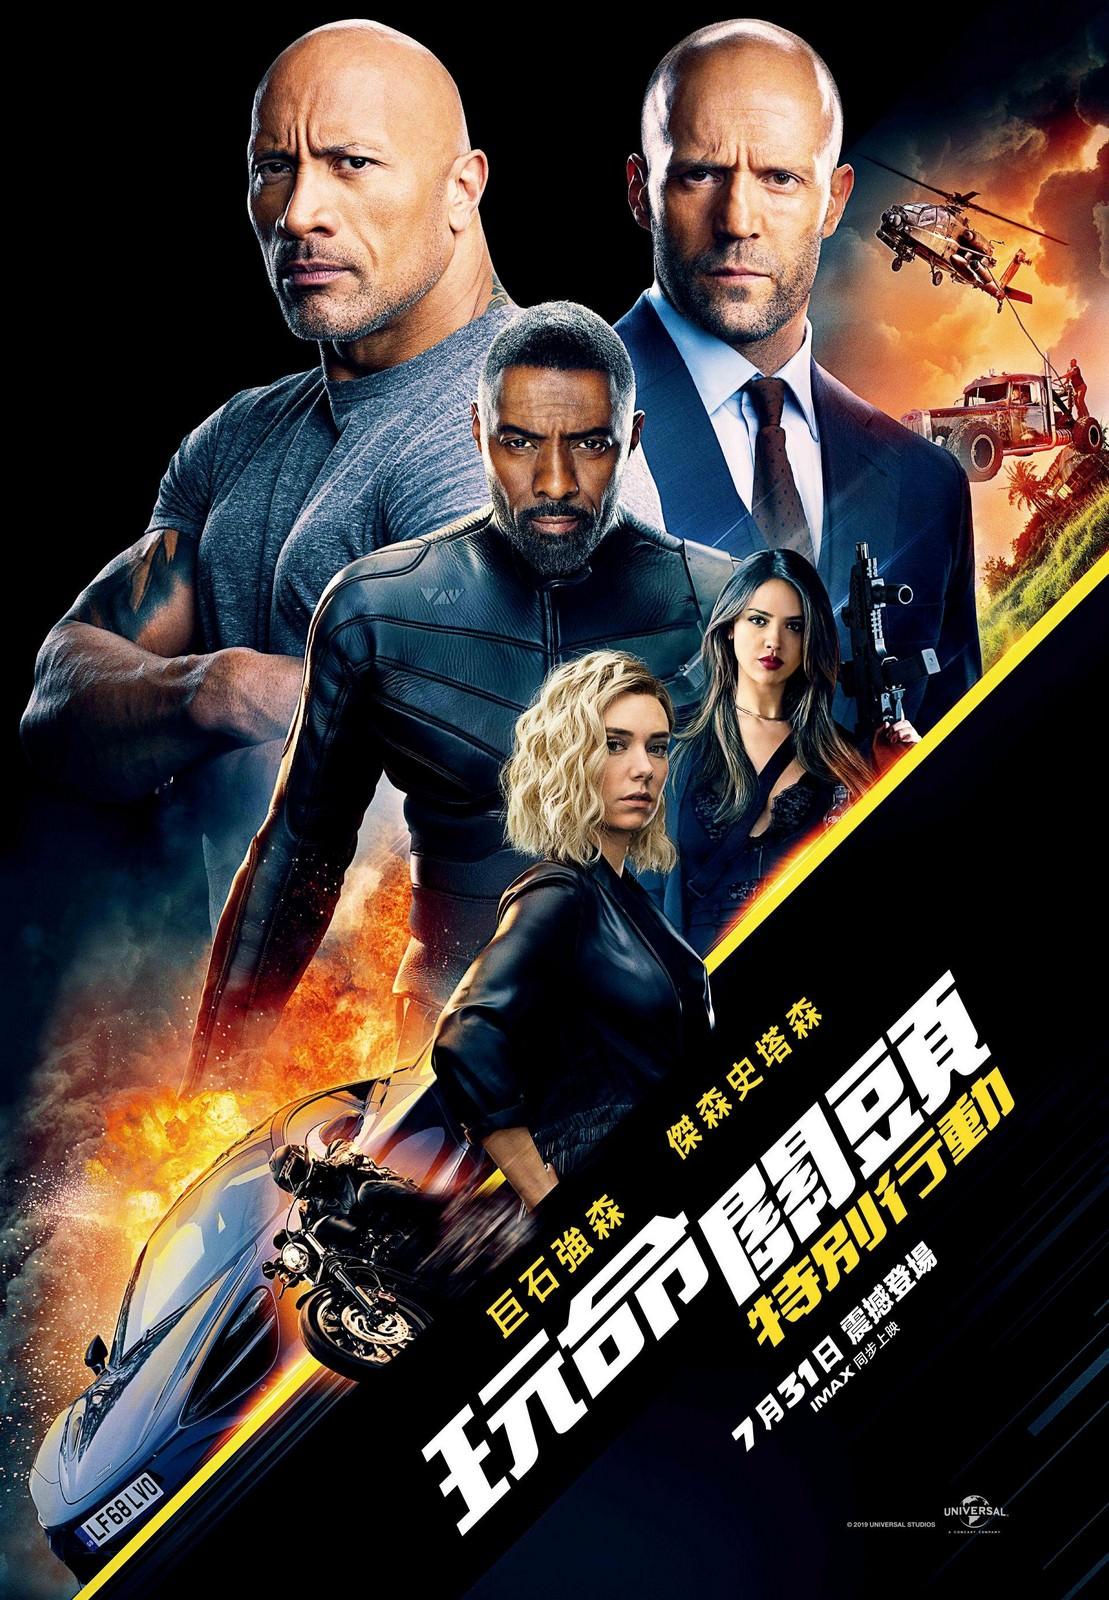 Movie, Fast & Furious Presents: Hobbs & Shaw(美國, 2019年) / 玩命關頭:特別行動(台灣) / 速度与激情:特别行动(中國) / 狂野時速:雙雄聯盟(香港), 電影海報, 台灣